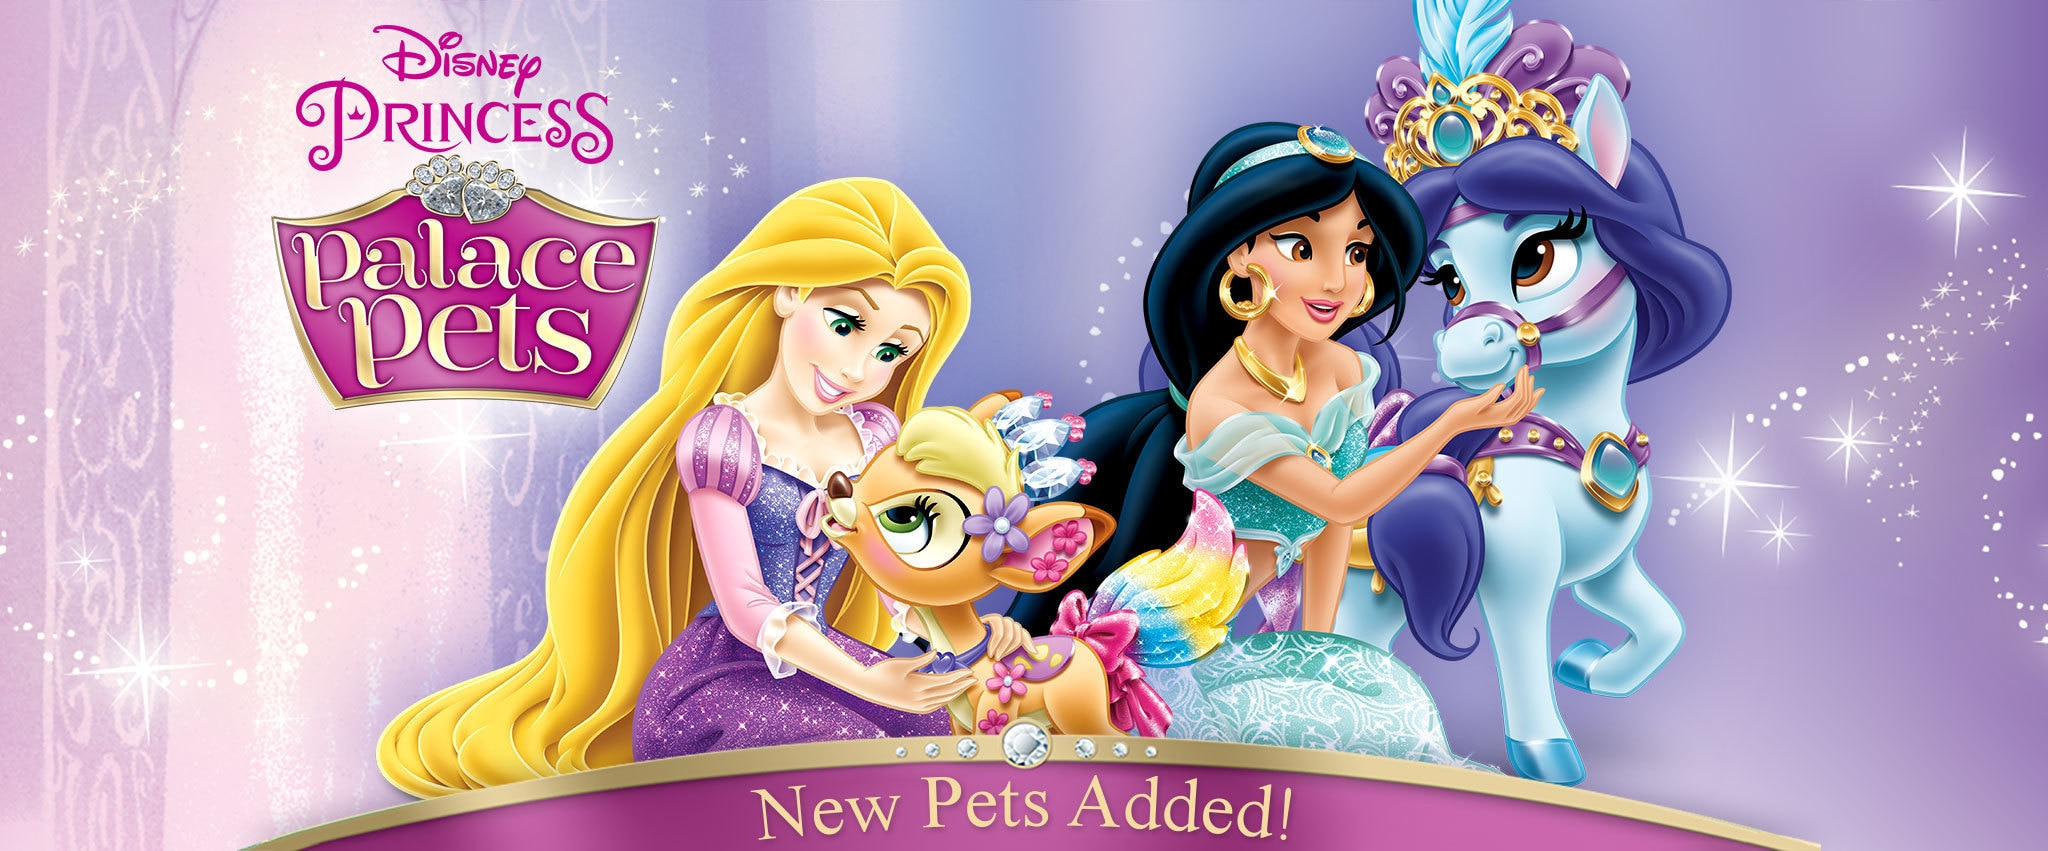 Disney Princess Palace Pets Disney Lol